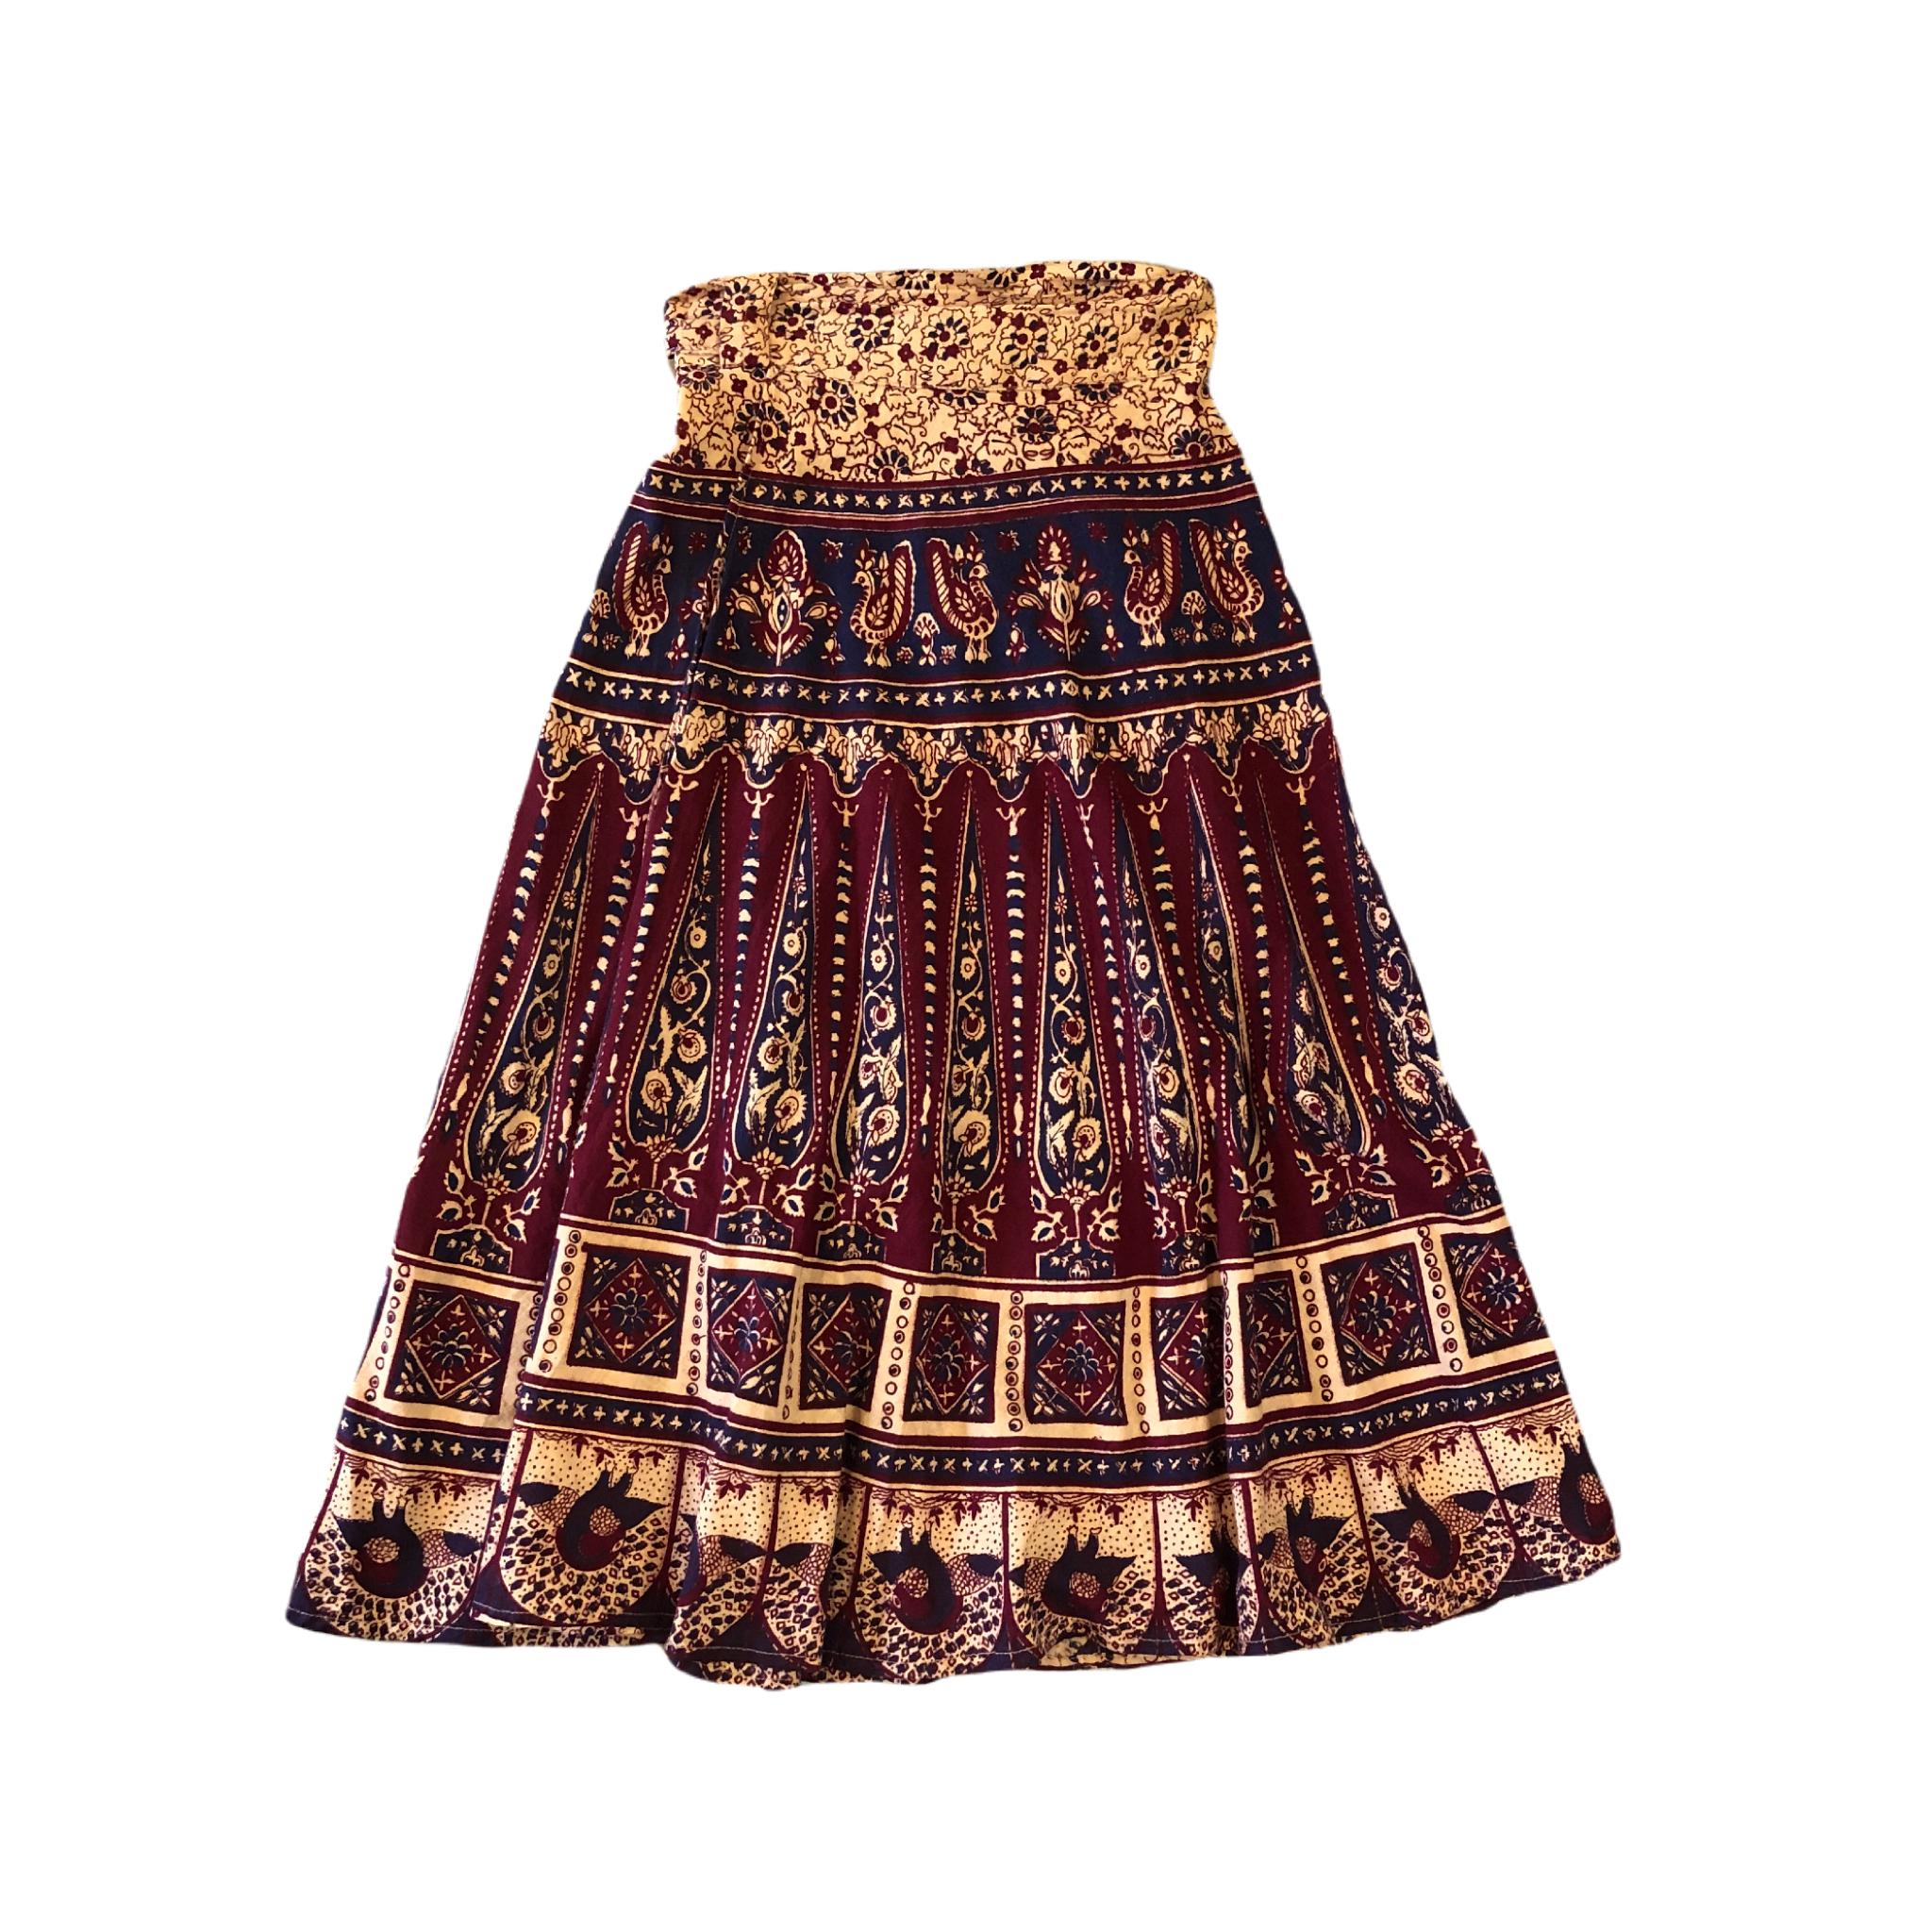 Ethnic Wrap Skirt ¥5,700+tax